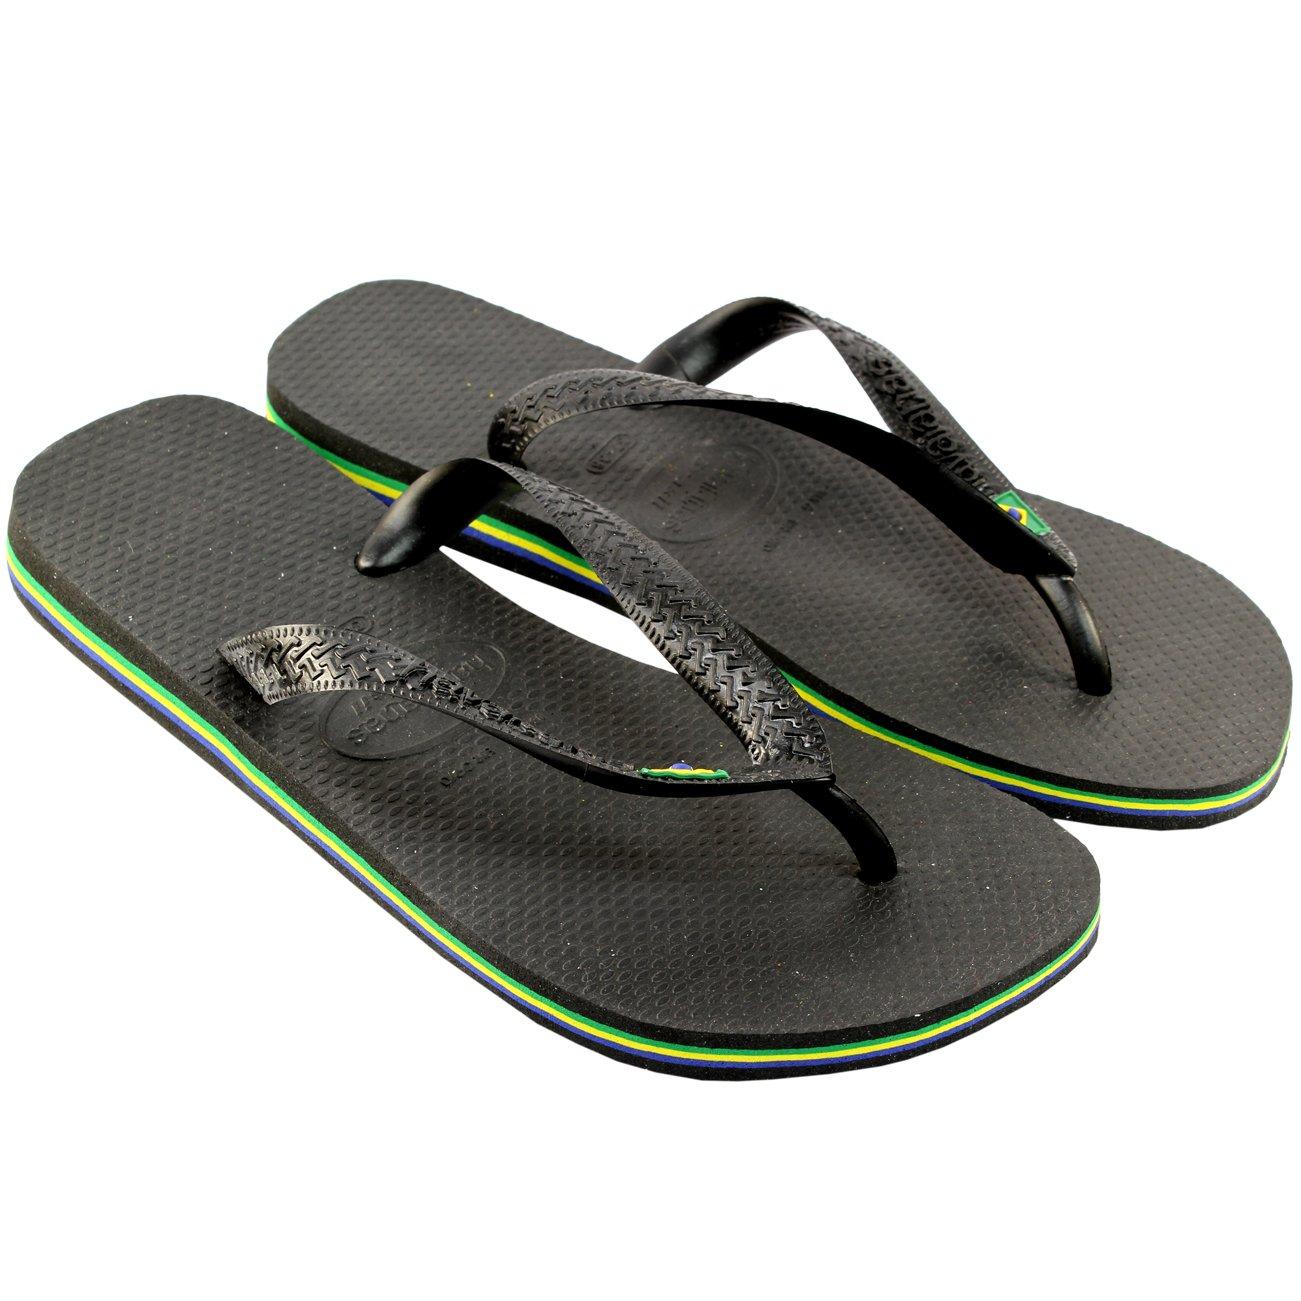 Herren Sandalen Havaianas Brasil Flip Flop Sandals  35/36 EU|Schwarz